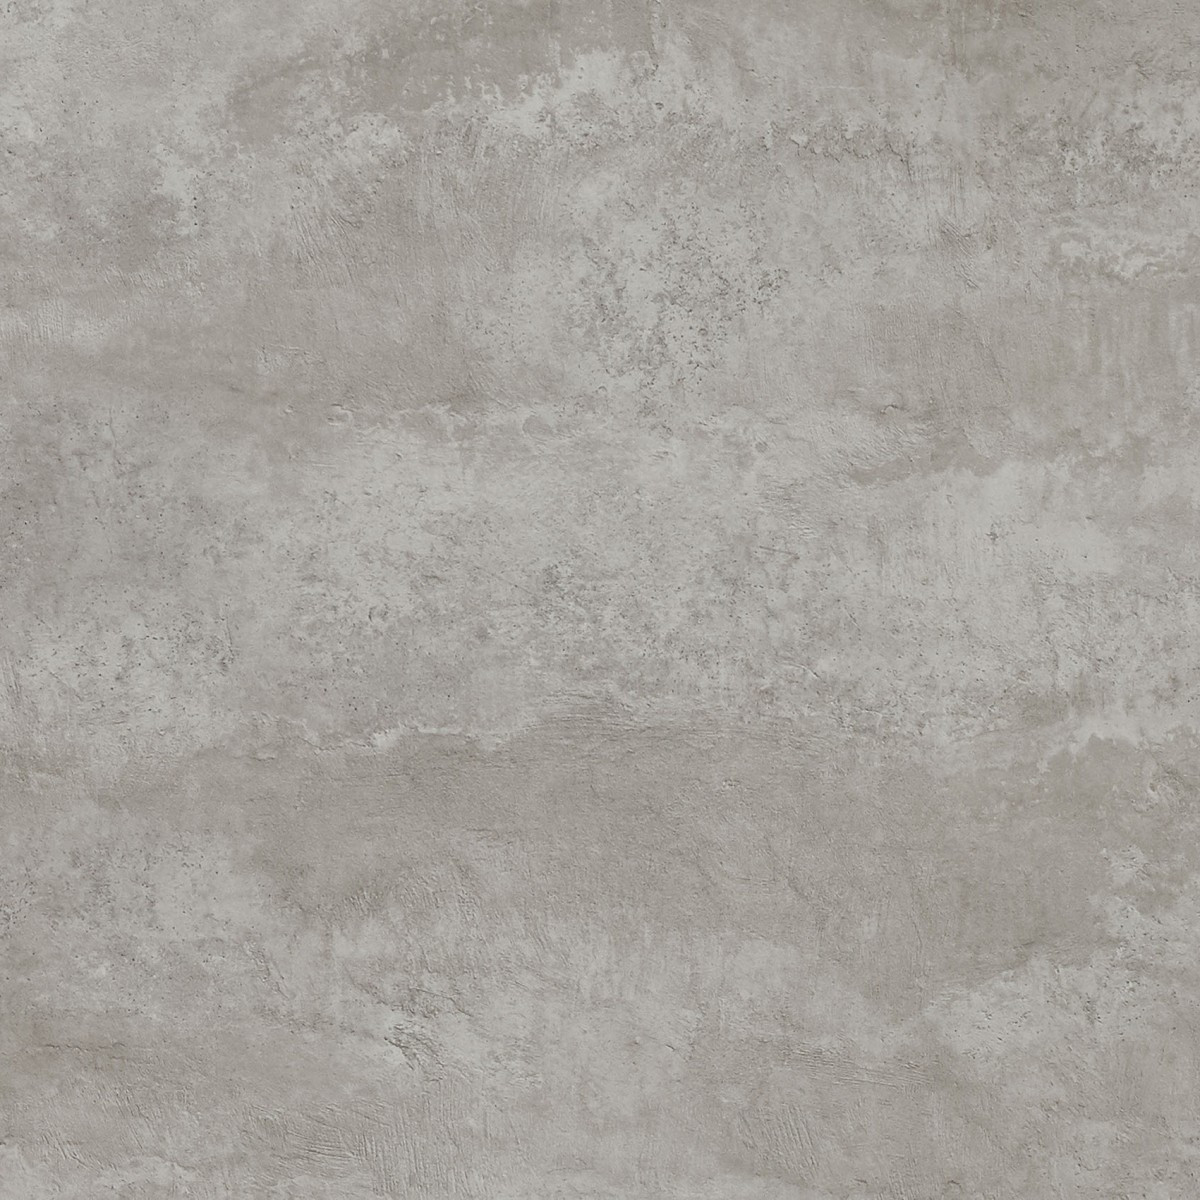 Столешница S529 Асканит 1U 38 3050 600